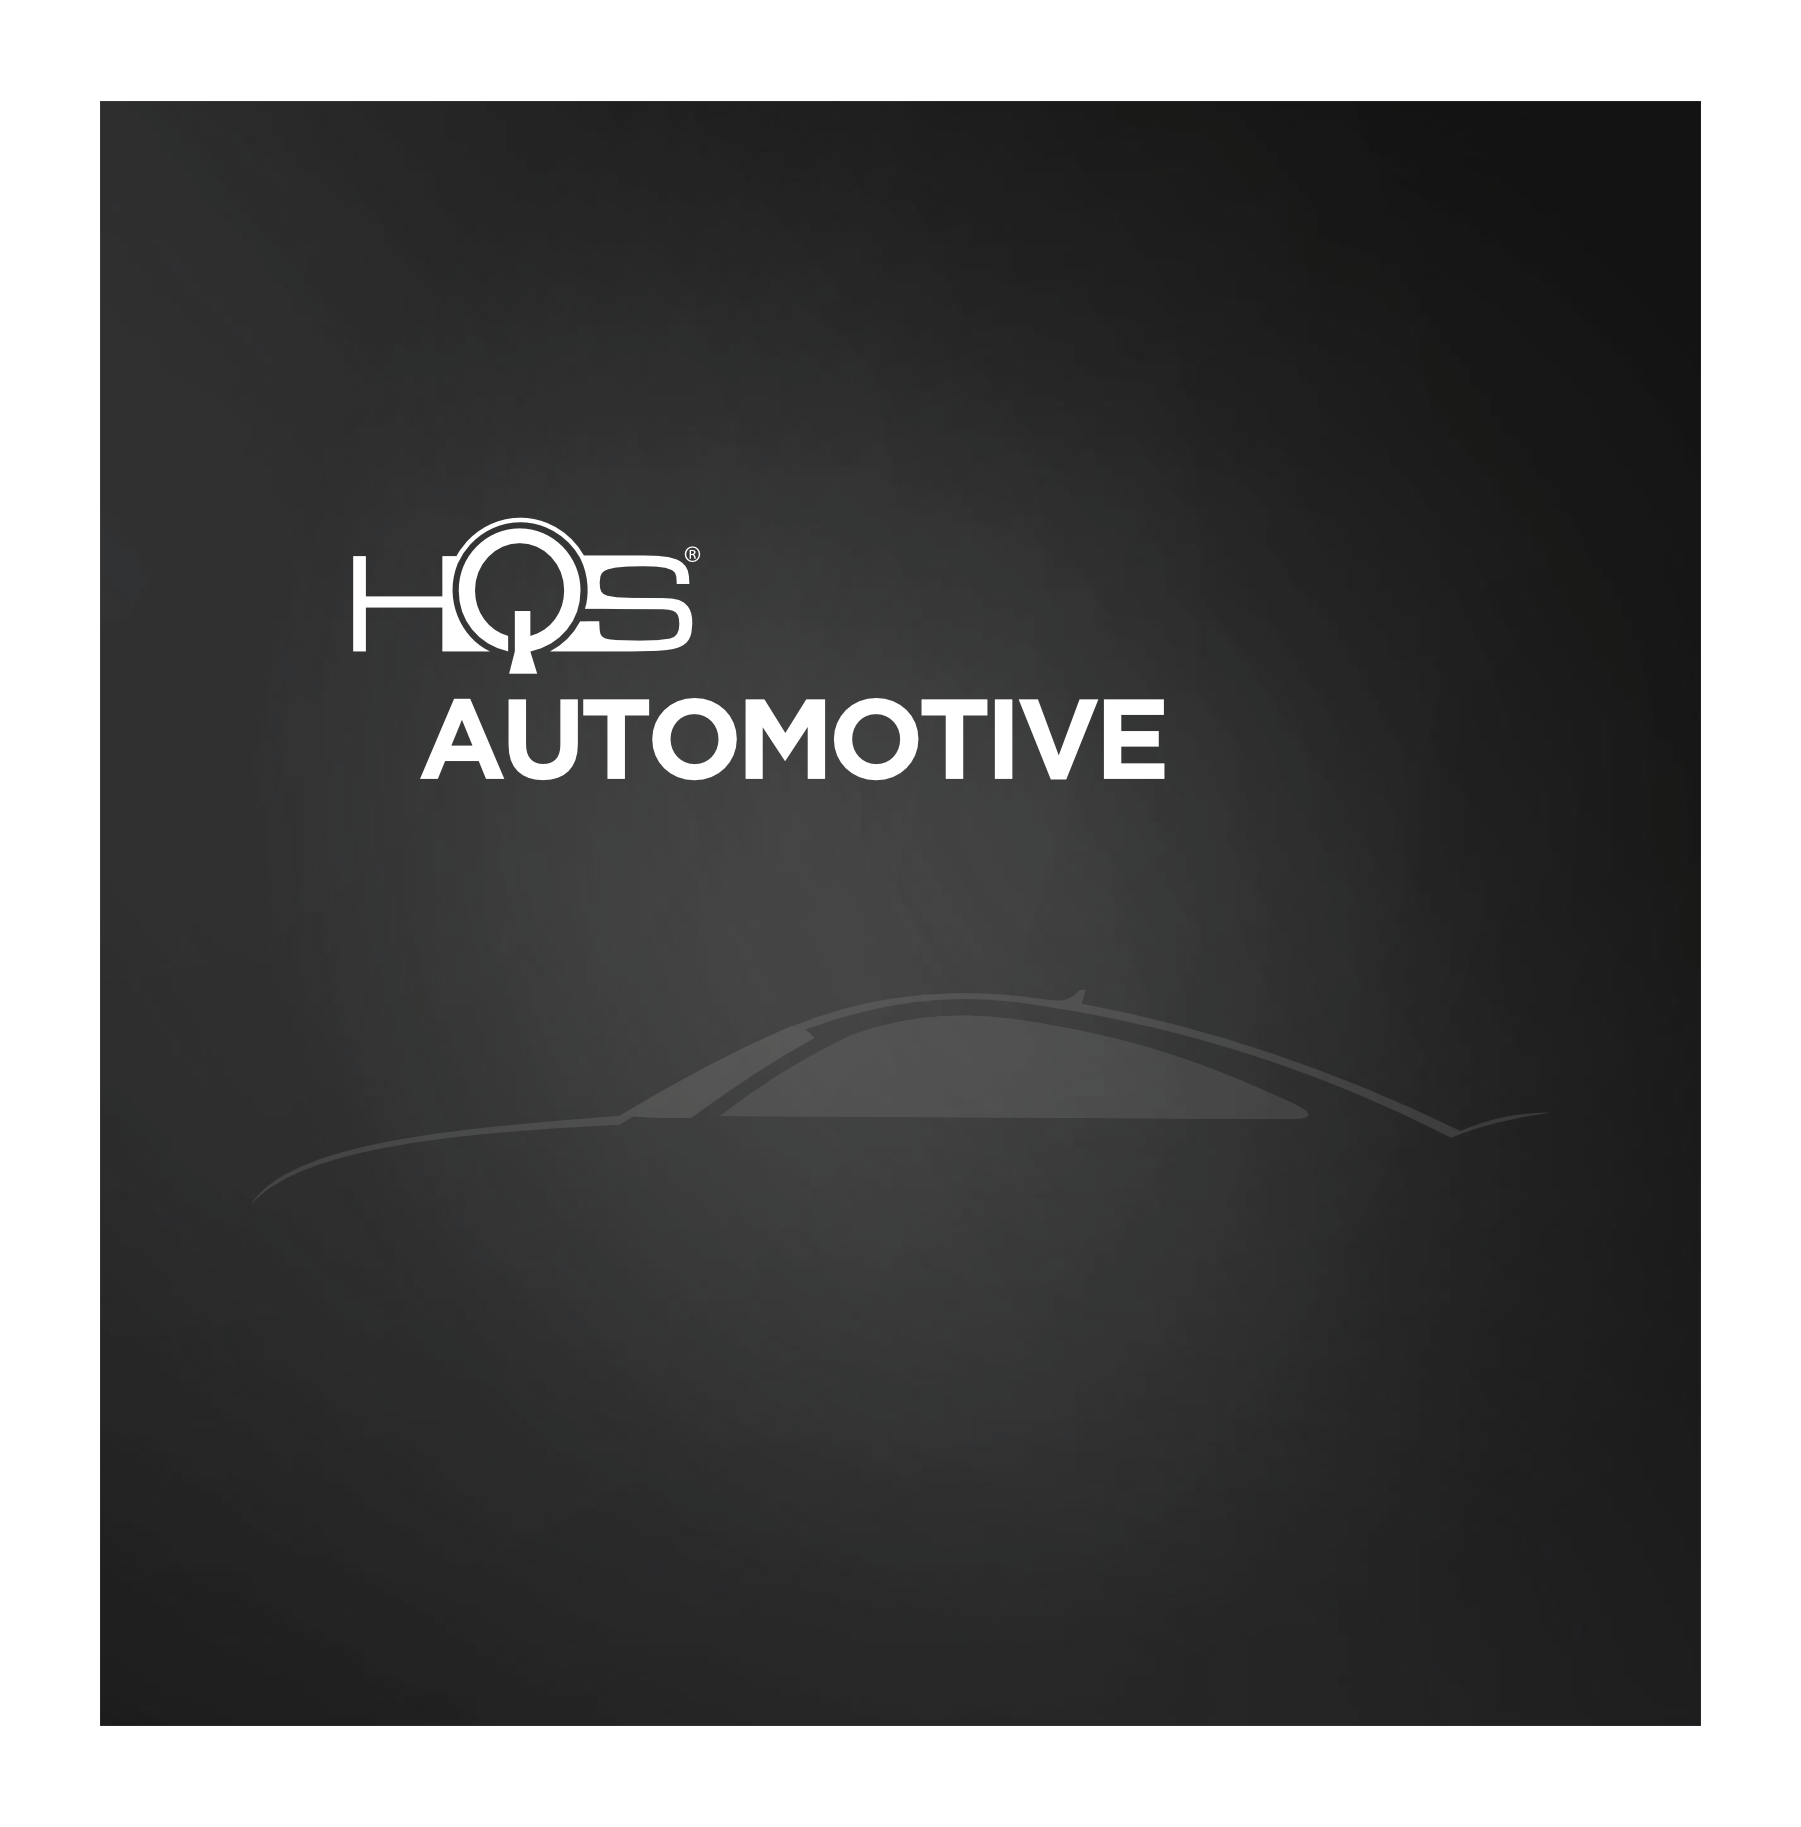 automotive_indice_heldis_web.jpg